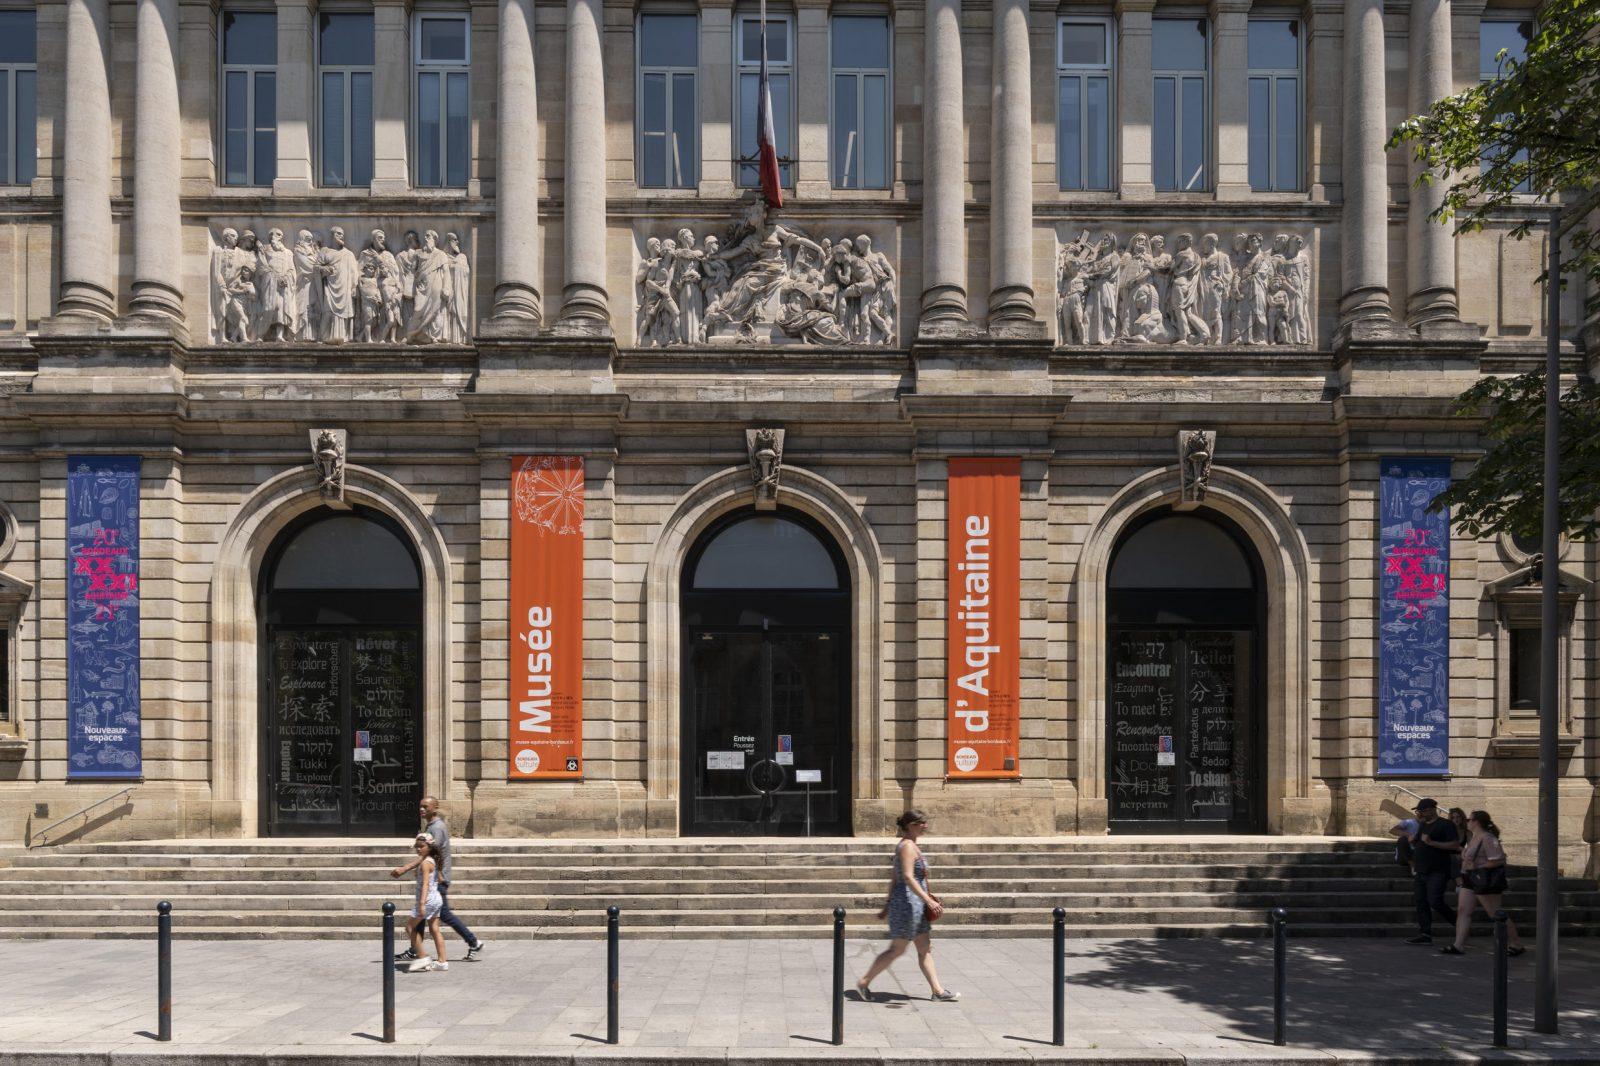 Façade du musée d' Aquitaine